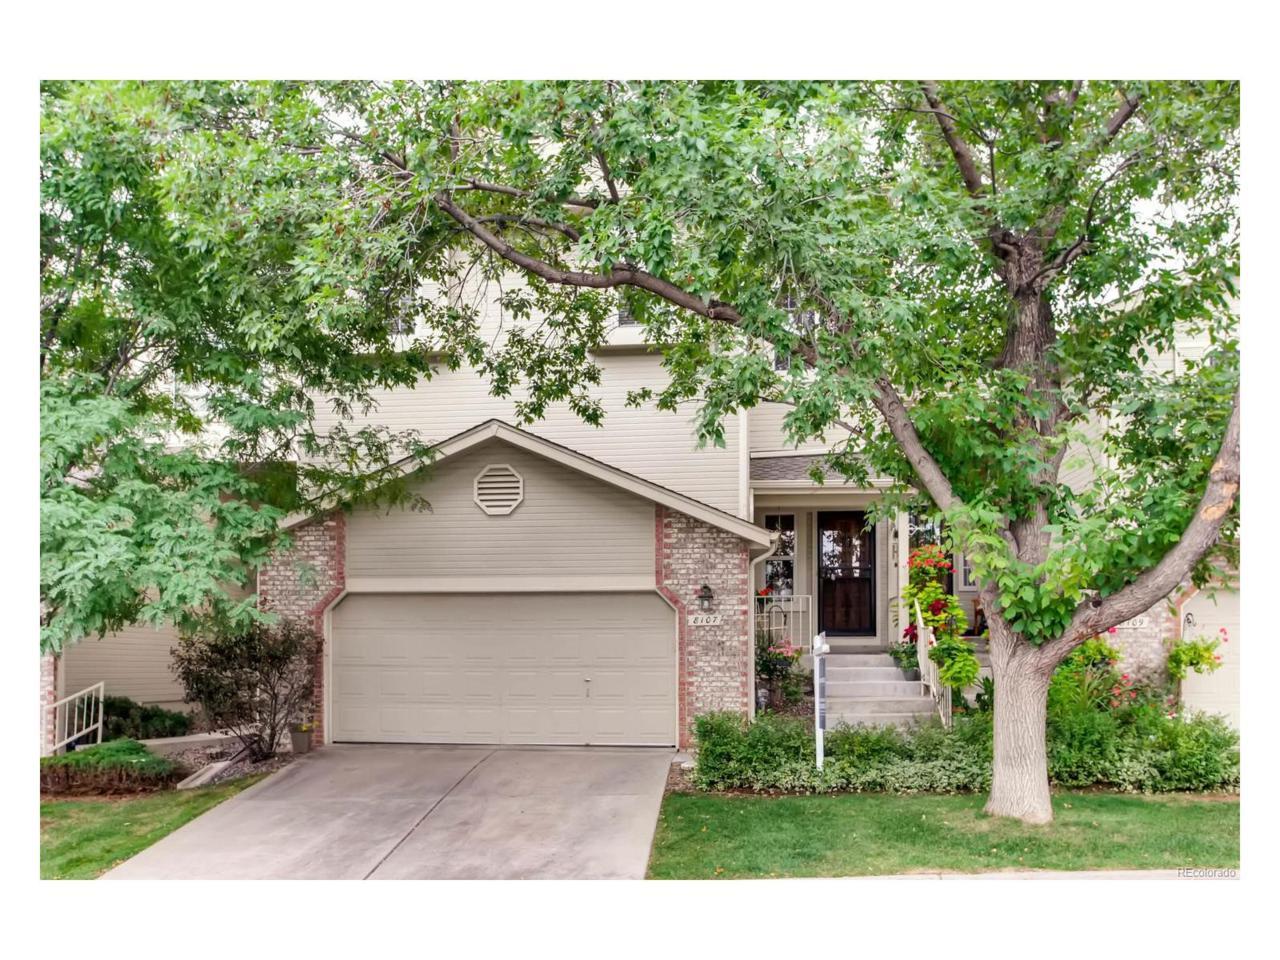 8107 S Humboldt Circle, Centennial, CO 80122 (MLS #8491321) :: 8z Real Estate